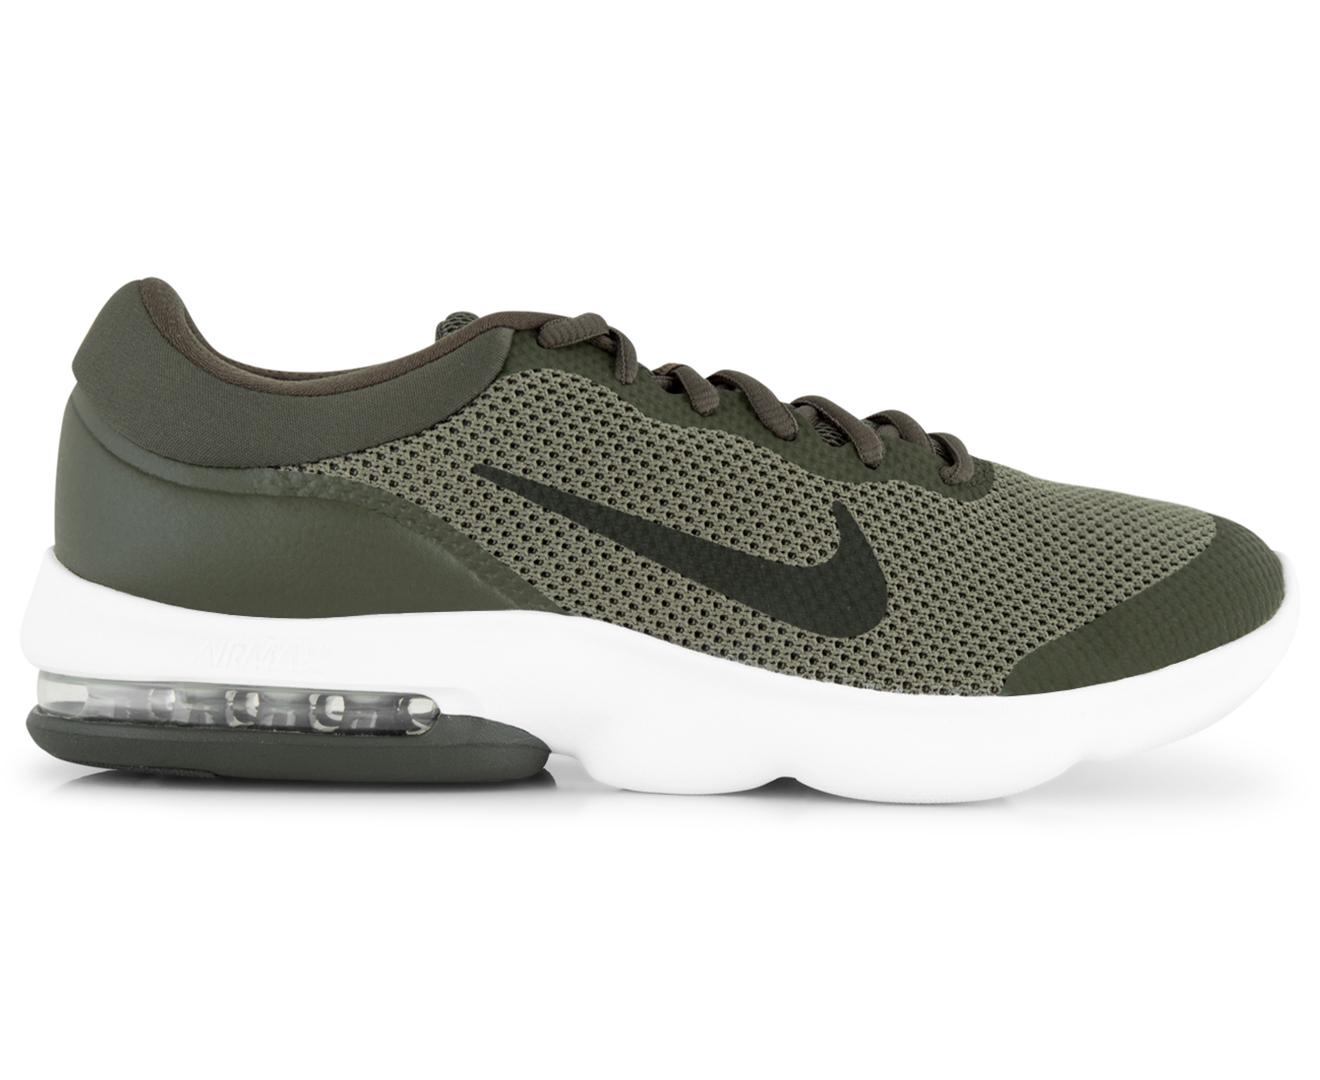 c1facf51986a90 Nike Men s Air Max Advantage Shoe - Medium Olive Sequoia